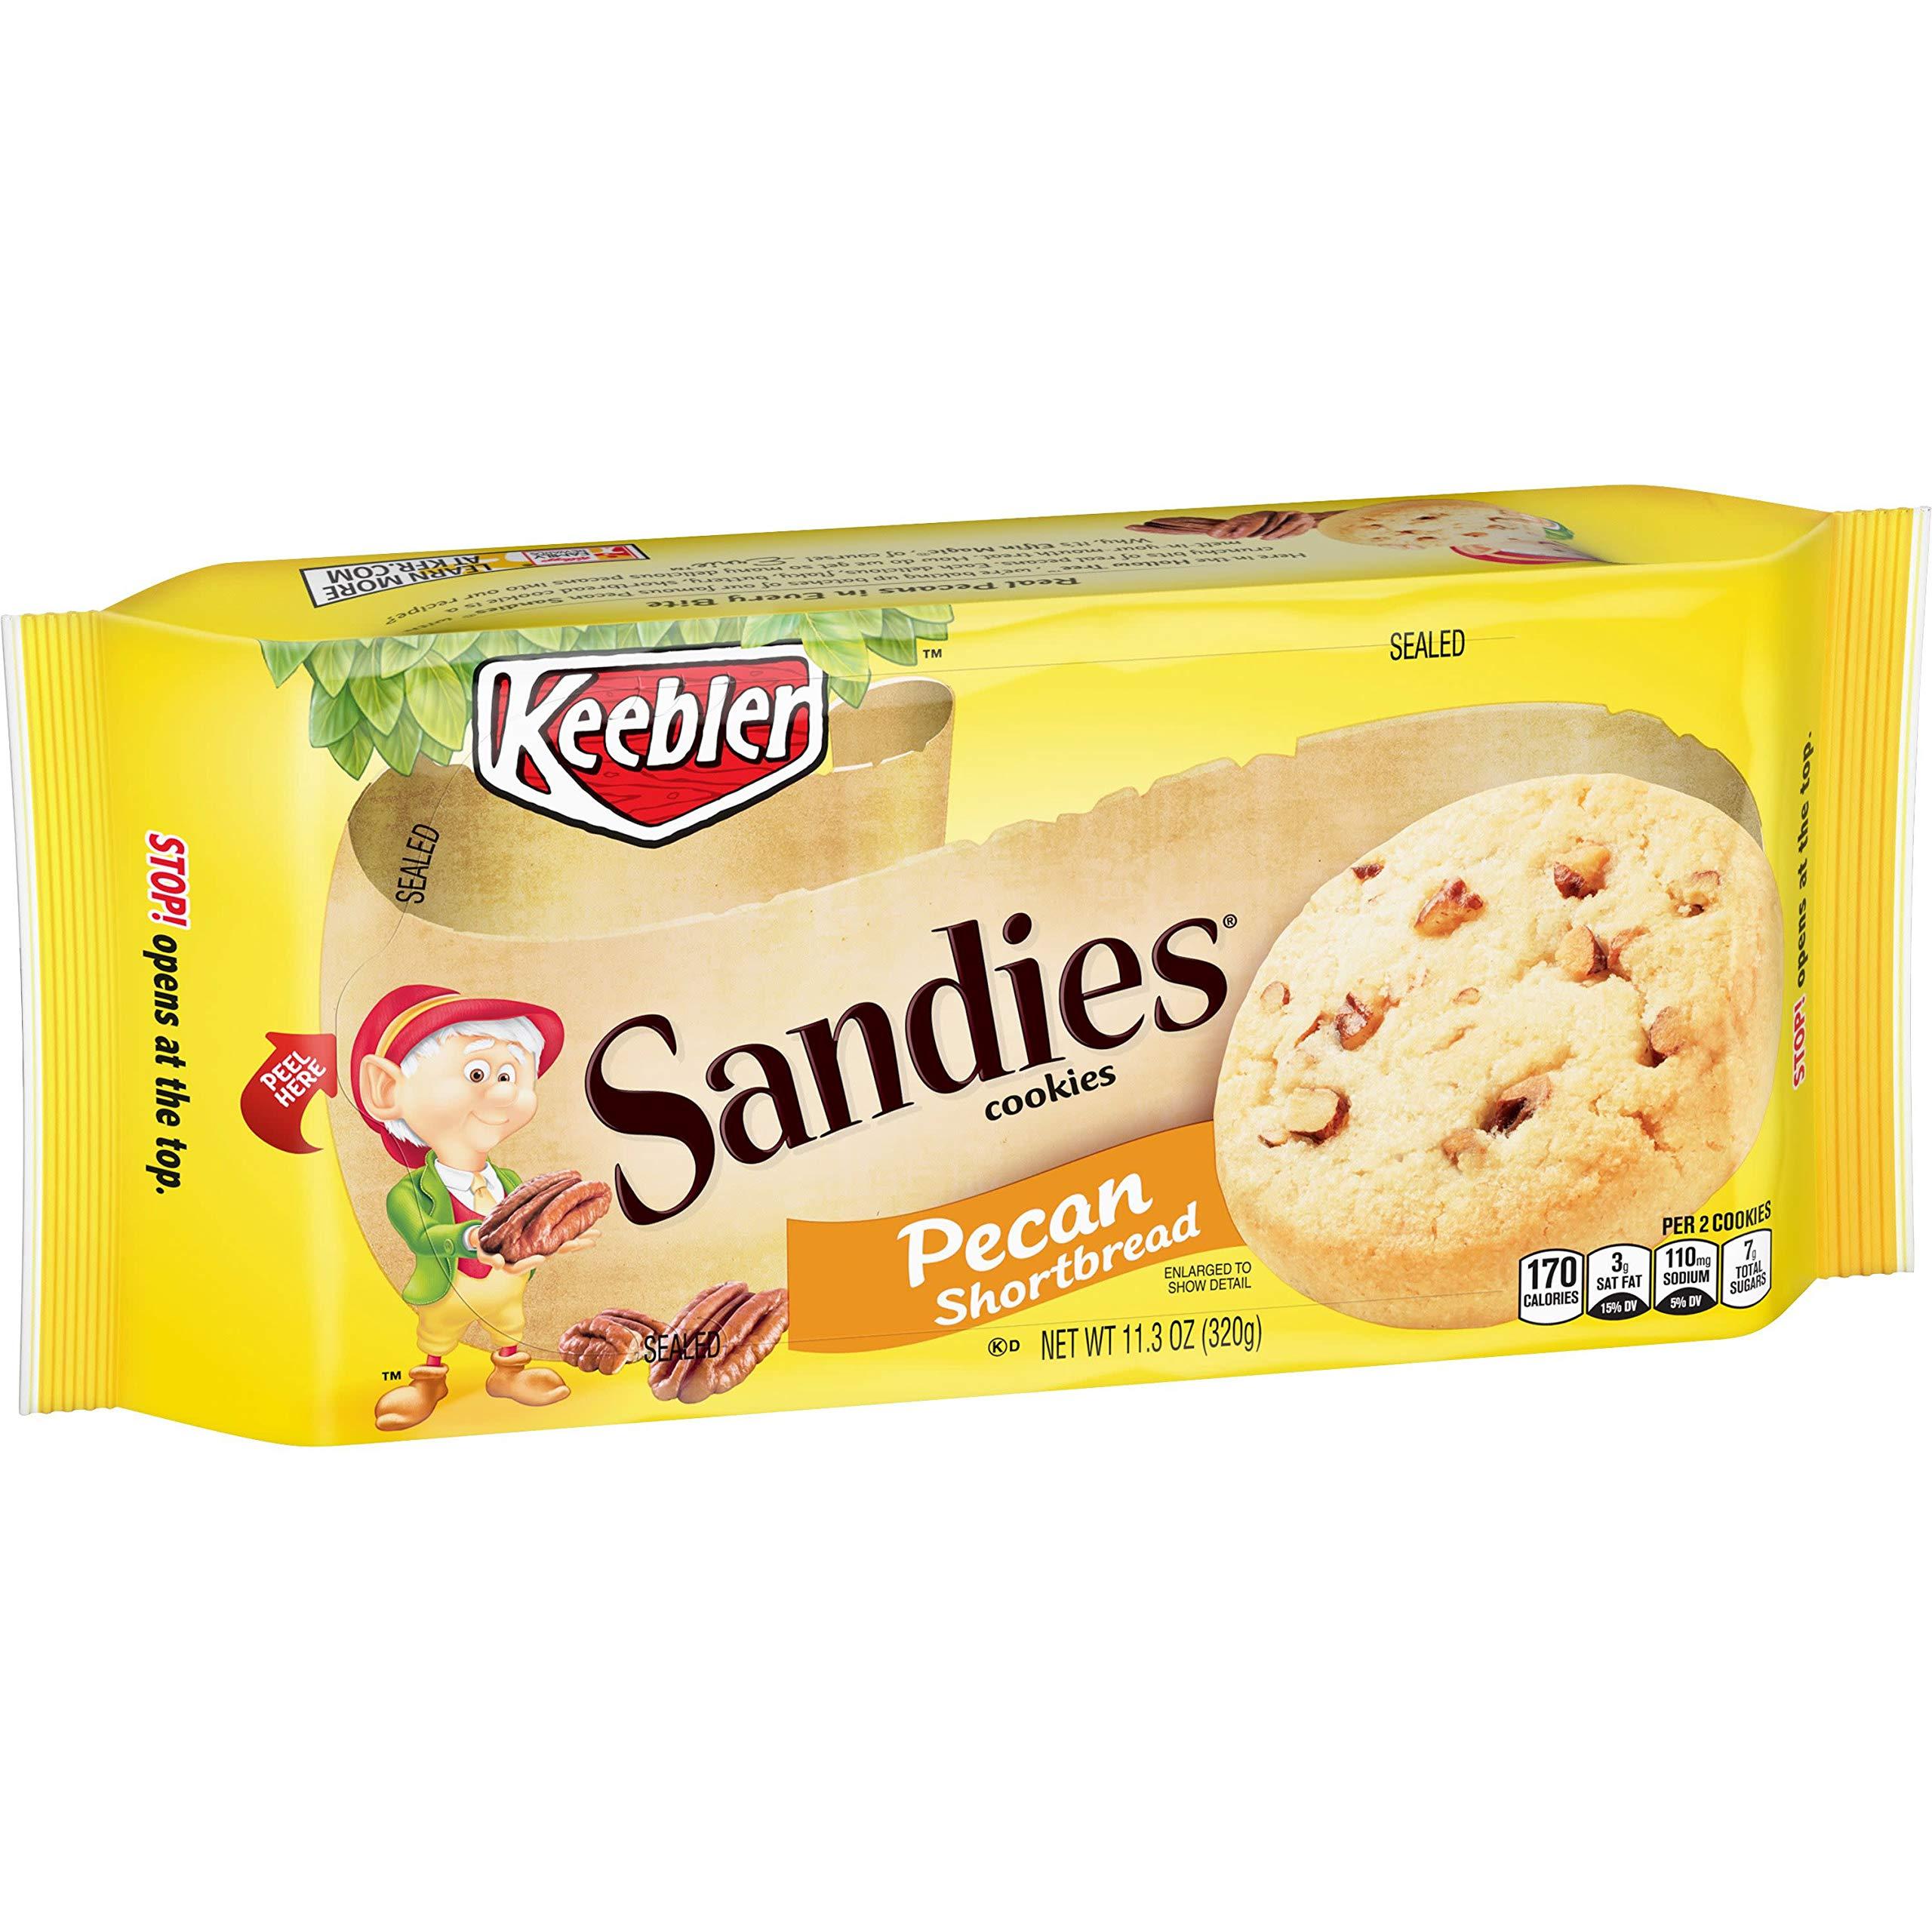 Keebler SandiesCookies, Pecan Shortbread, 11.3oz Tray